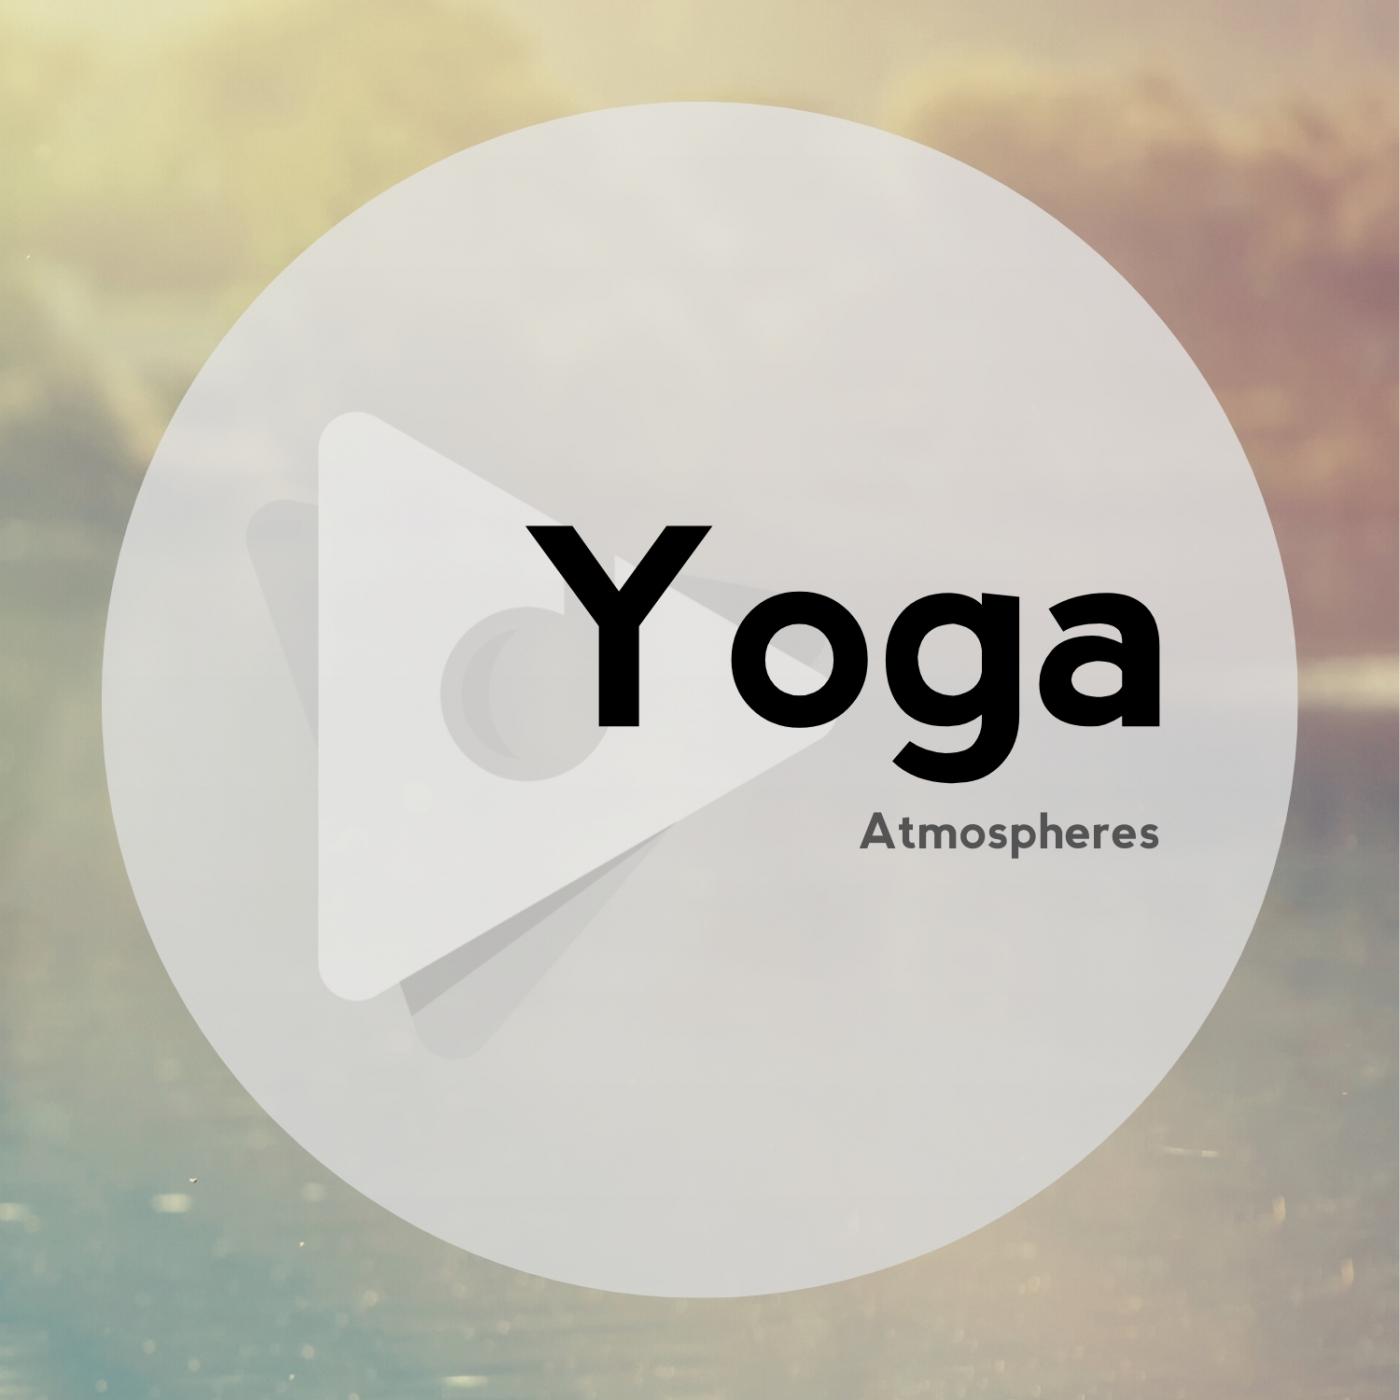 Yoga Atmospheres